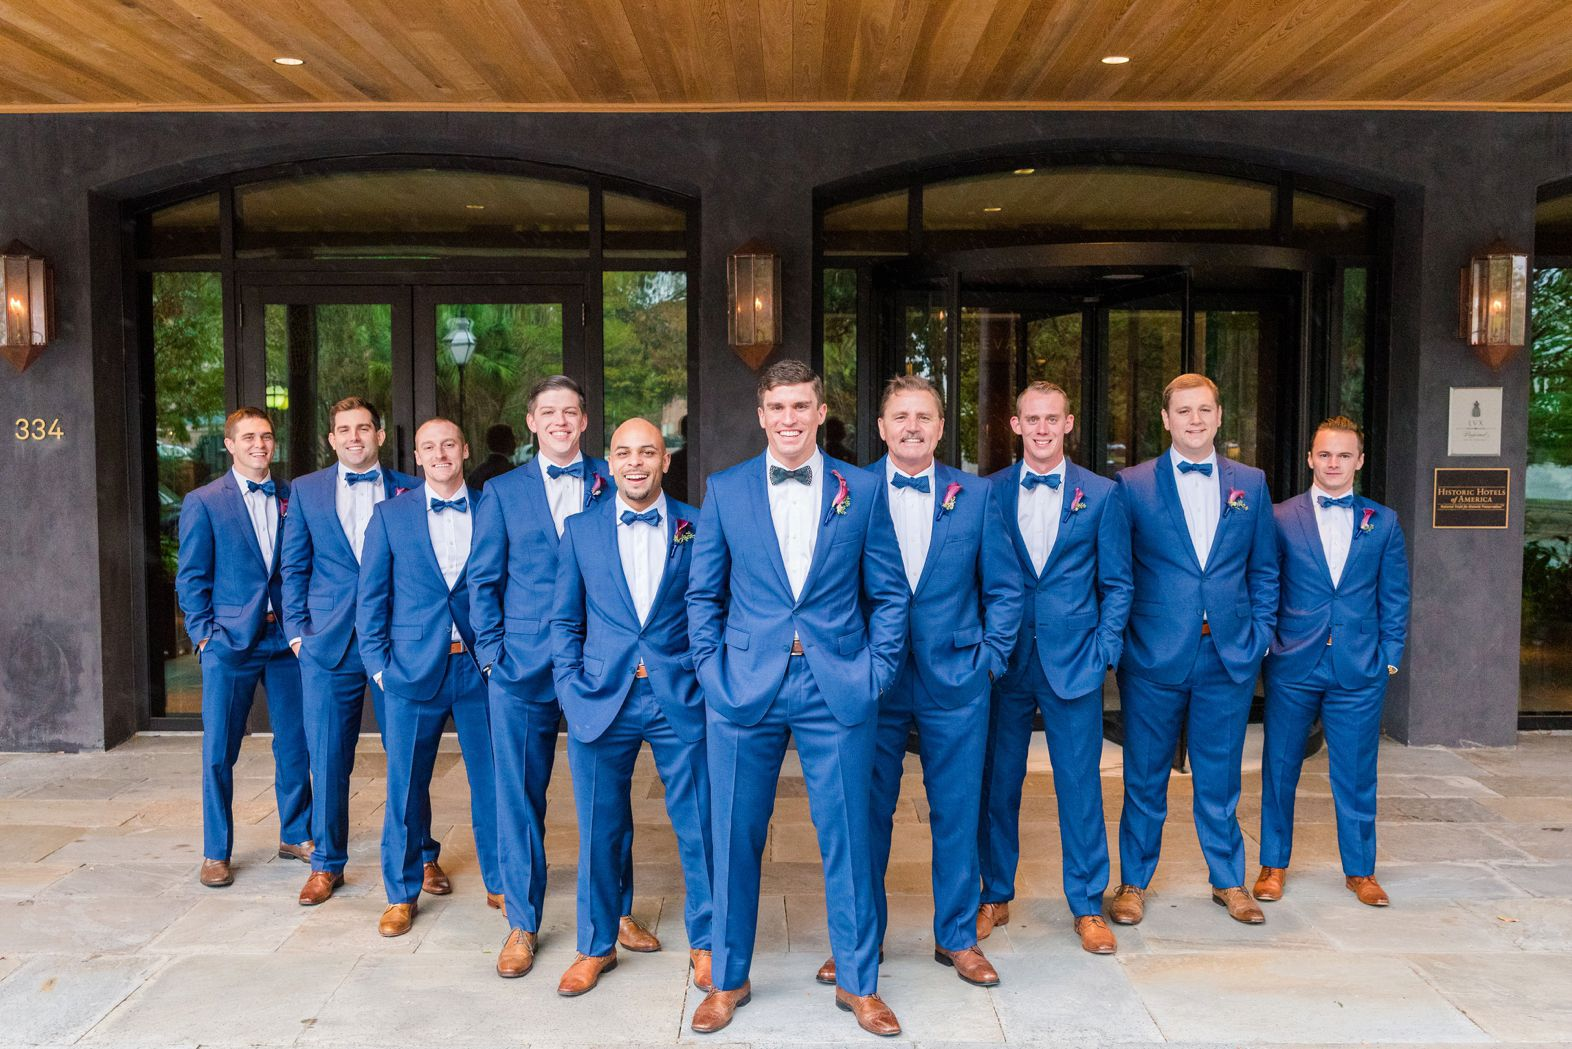 Dapper Bright Blue Suits Rainy Charleston Wedding at The